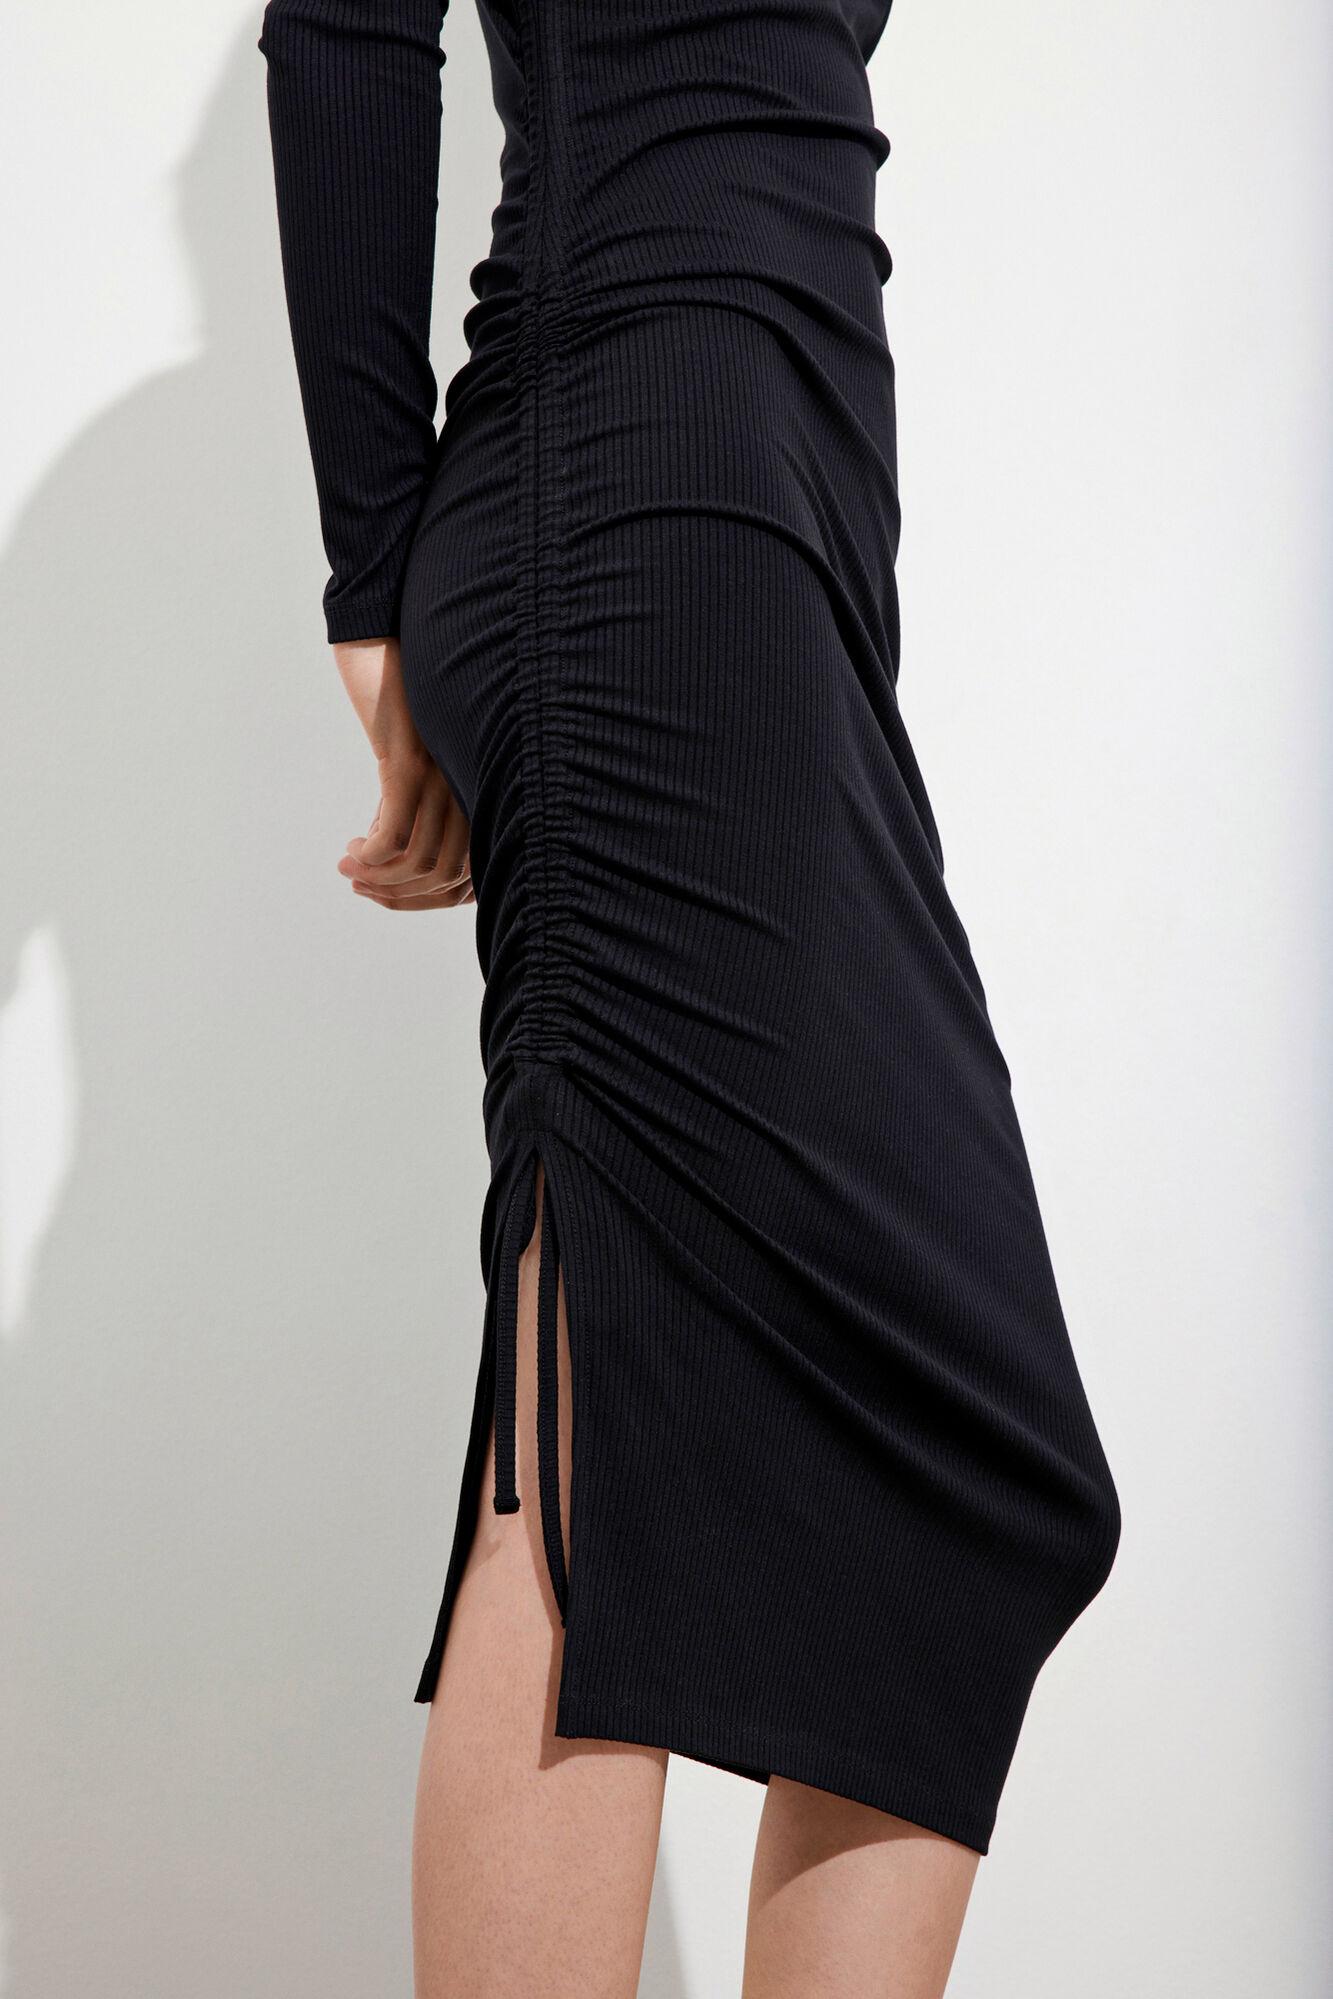 ENZOE LS SQUARE DRESS 5344